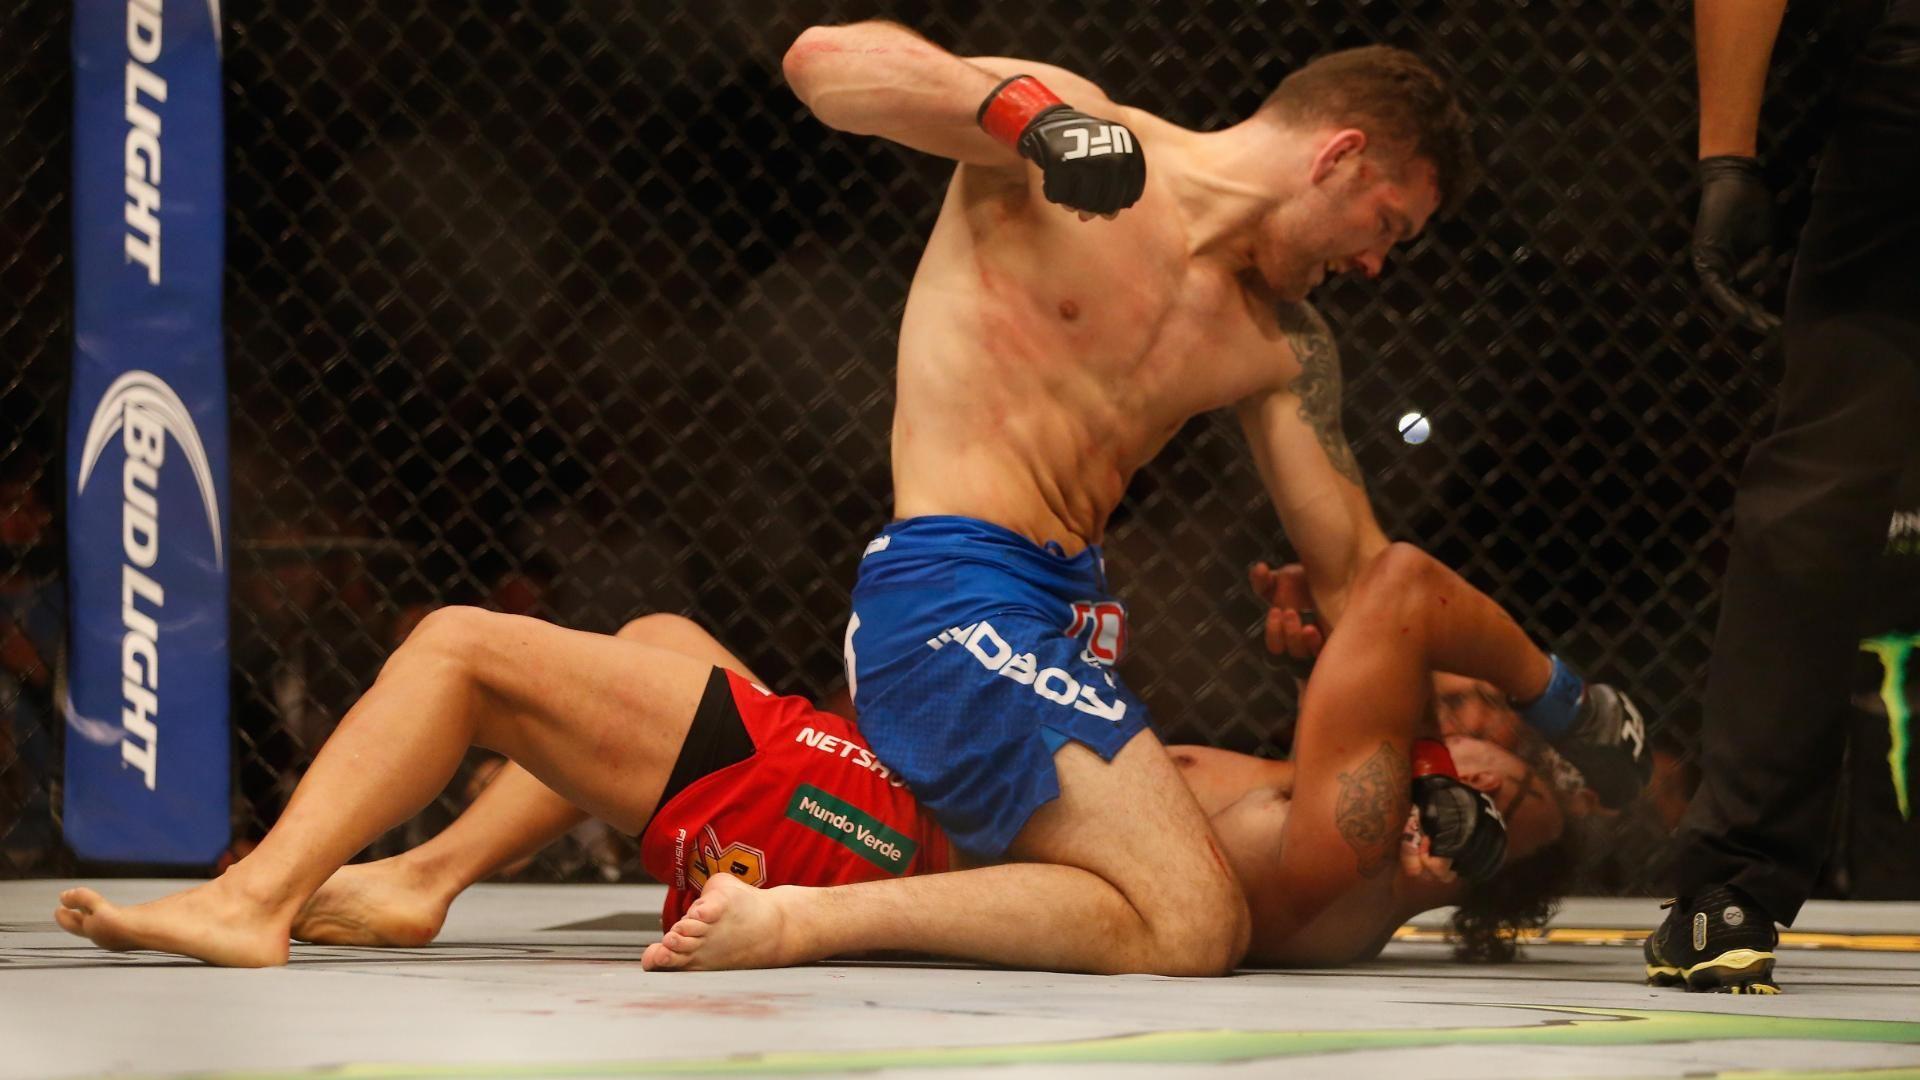 https://secure.espncdn.com/combiner/i?img=/media/motion/2015/0524/dm_150524_UFC_Chris_Weidman_and_Vitor_Belfort347/dm_150524_UFC_Chris_Weidman_and_Vitor_Belfort347.jpg